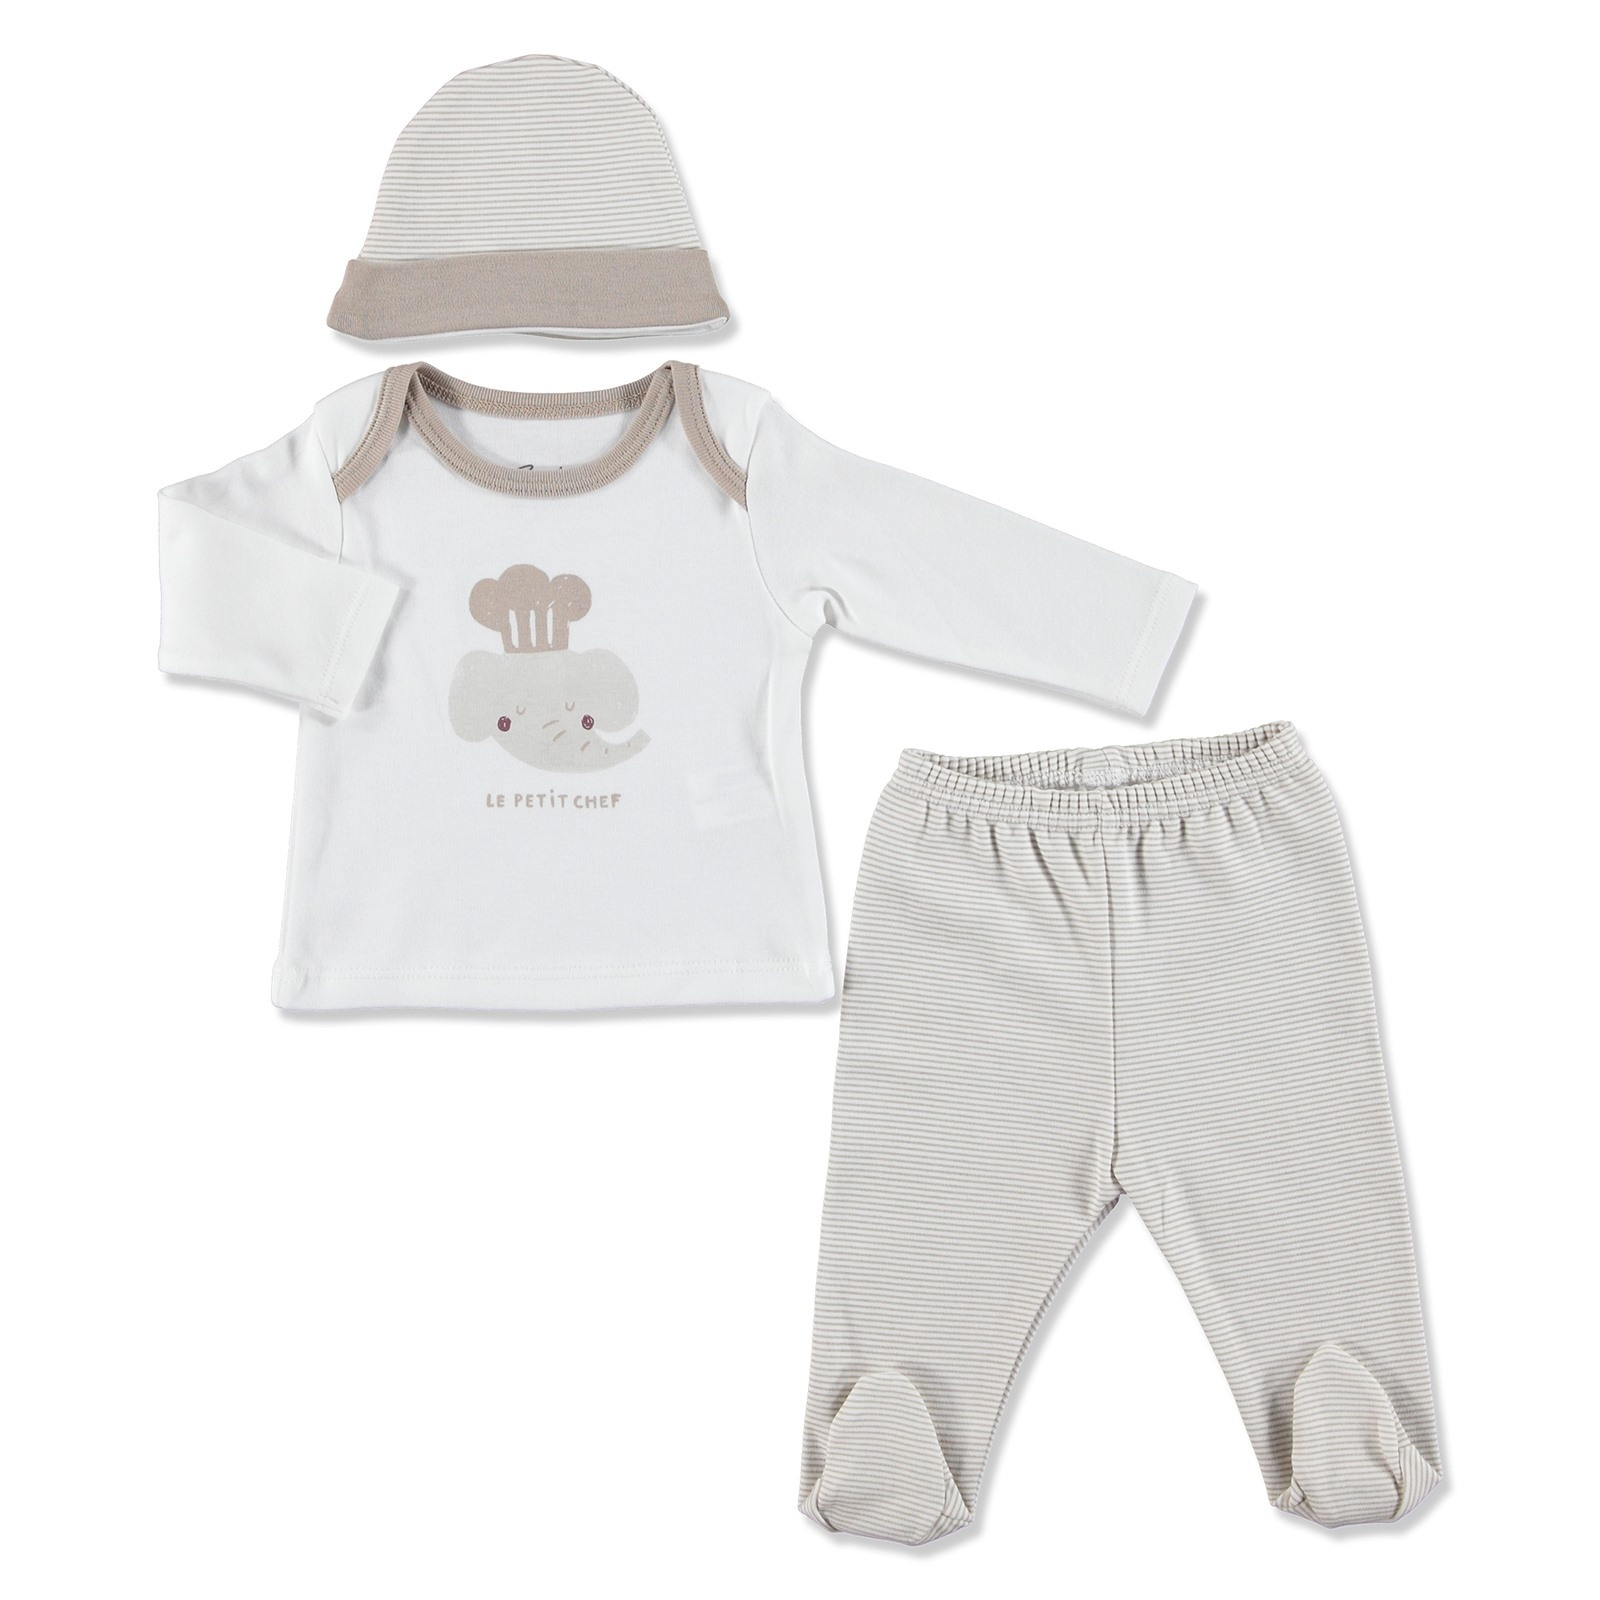 Ebebek Bambaki Summer Baby Boy Little Chief Bodysuit Hat Pant 3 Pcs Set